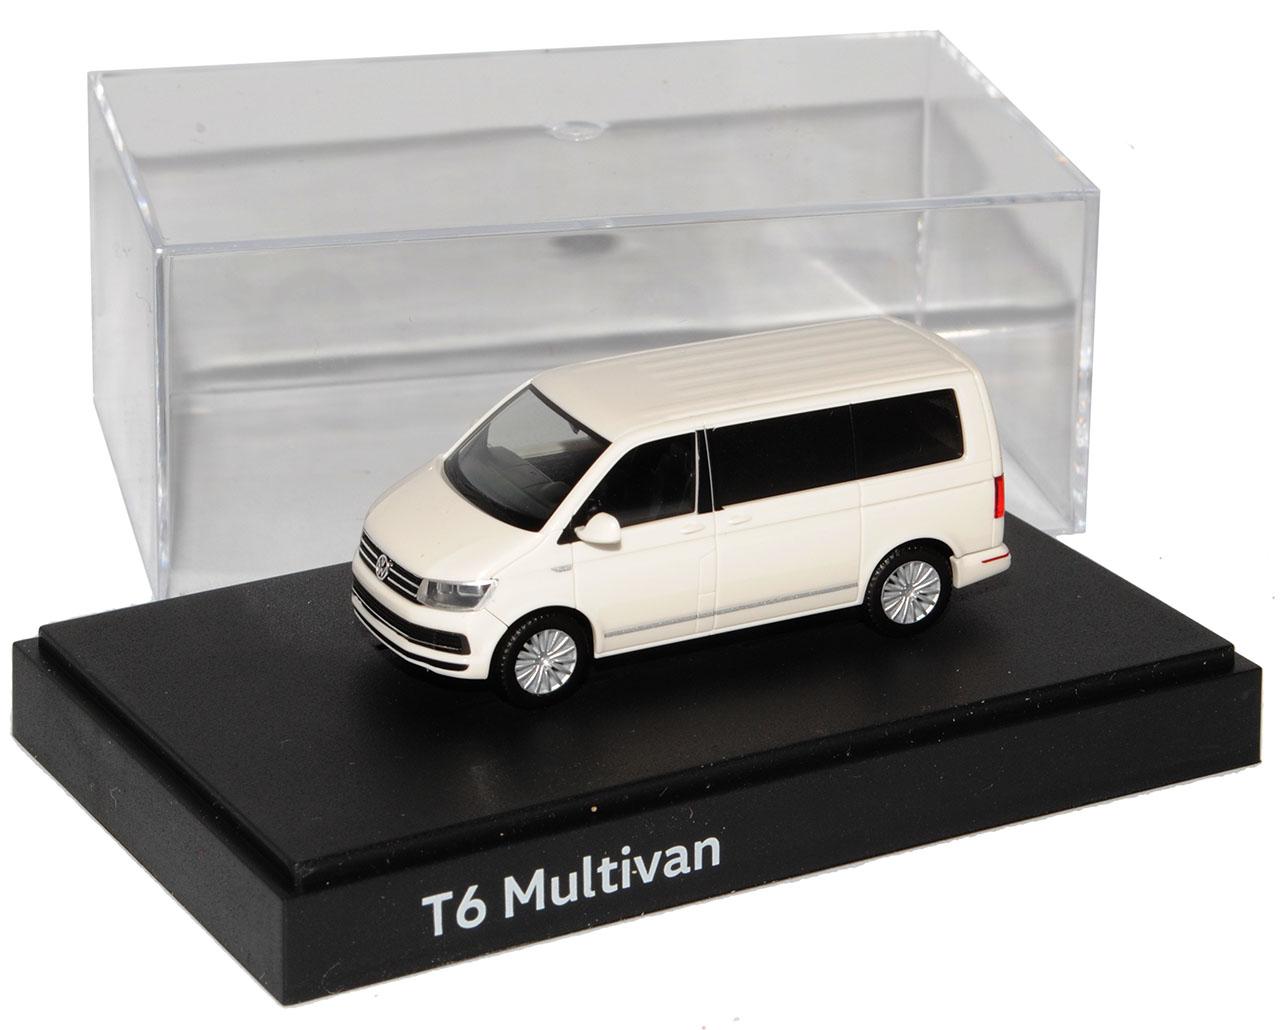 VW Volkswagen T6 Multivan Personen Transporter Weiss T5 Ab 2 Facelift 2015 H0..